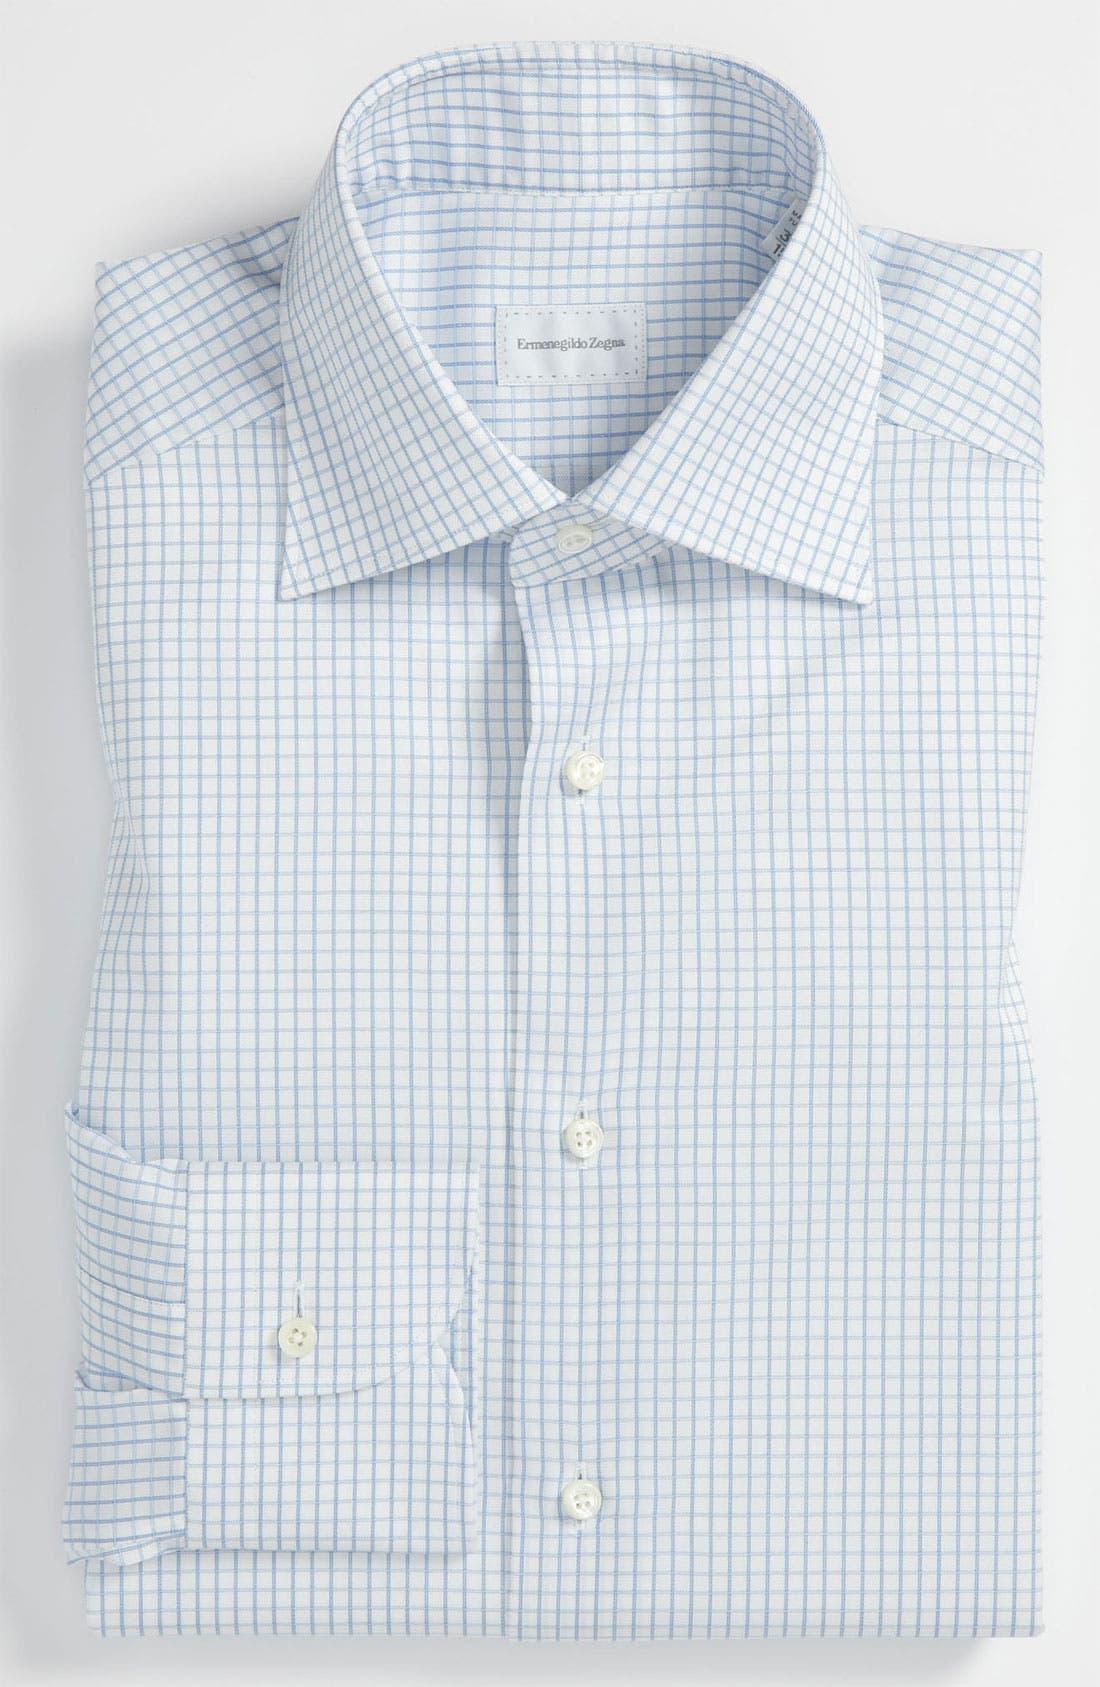 Regular Fit Dress Shirt,                             Main thumbnail 1, color,                             436